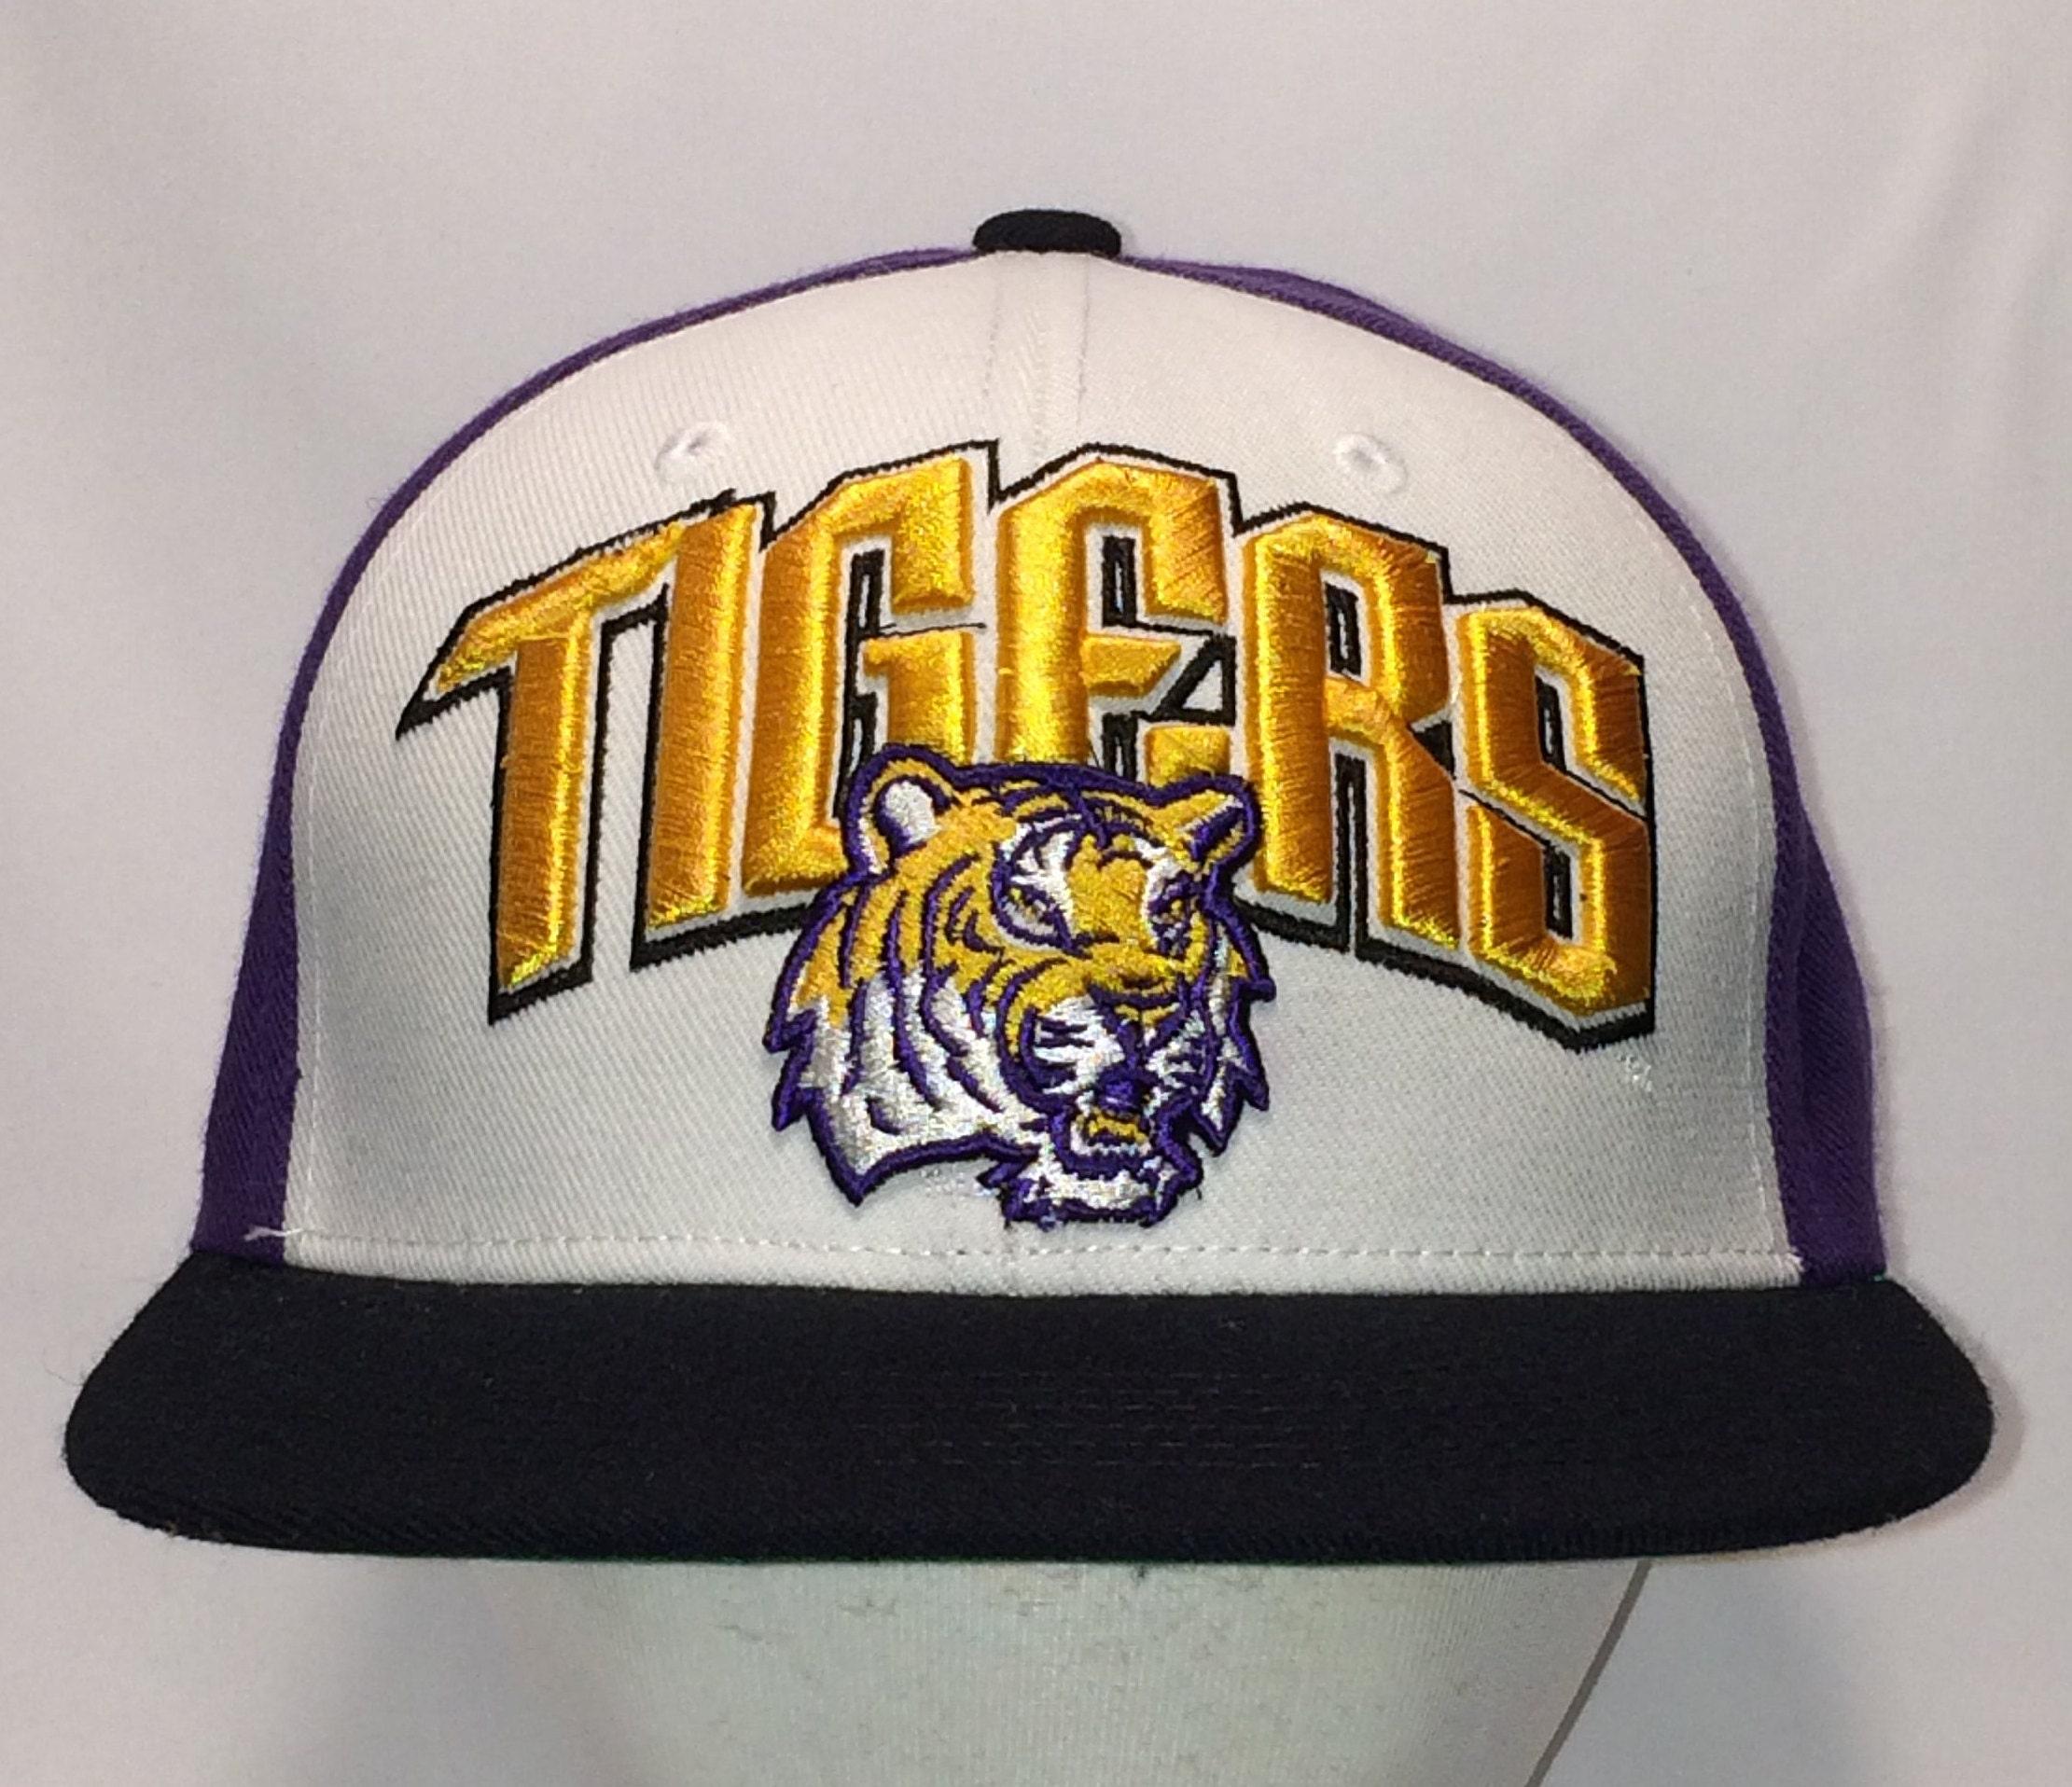 pretty nice 96ae3 0f665 ... low price vintage lsu tigers snapback hat ncaa basketball sports hats  ece11 334a8